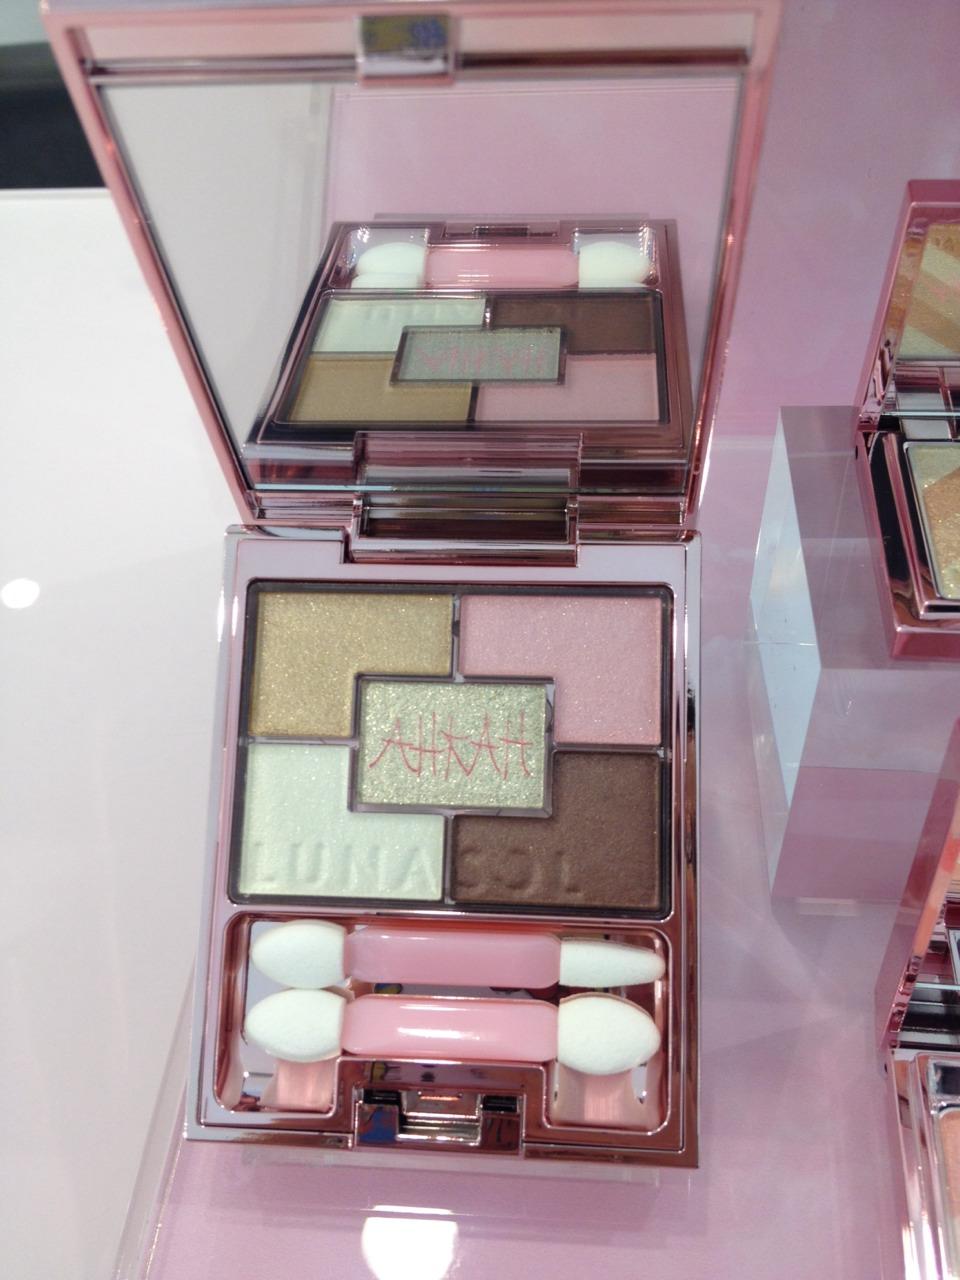 Kanebo LUNASOL AHKAH COLLECTION EYES #EX01 Sheer Pink Beige